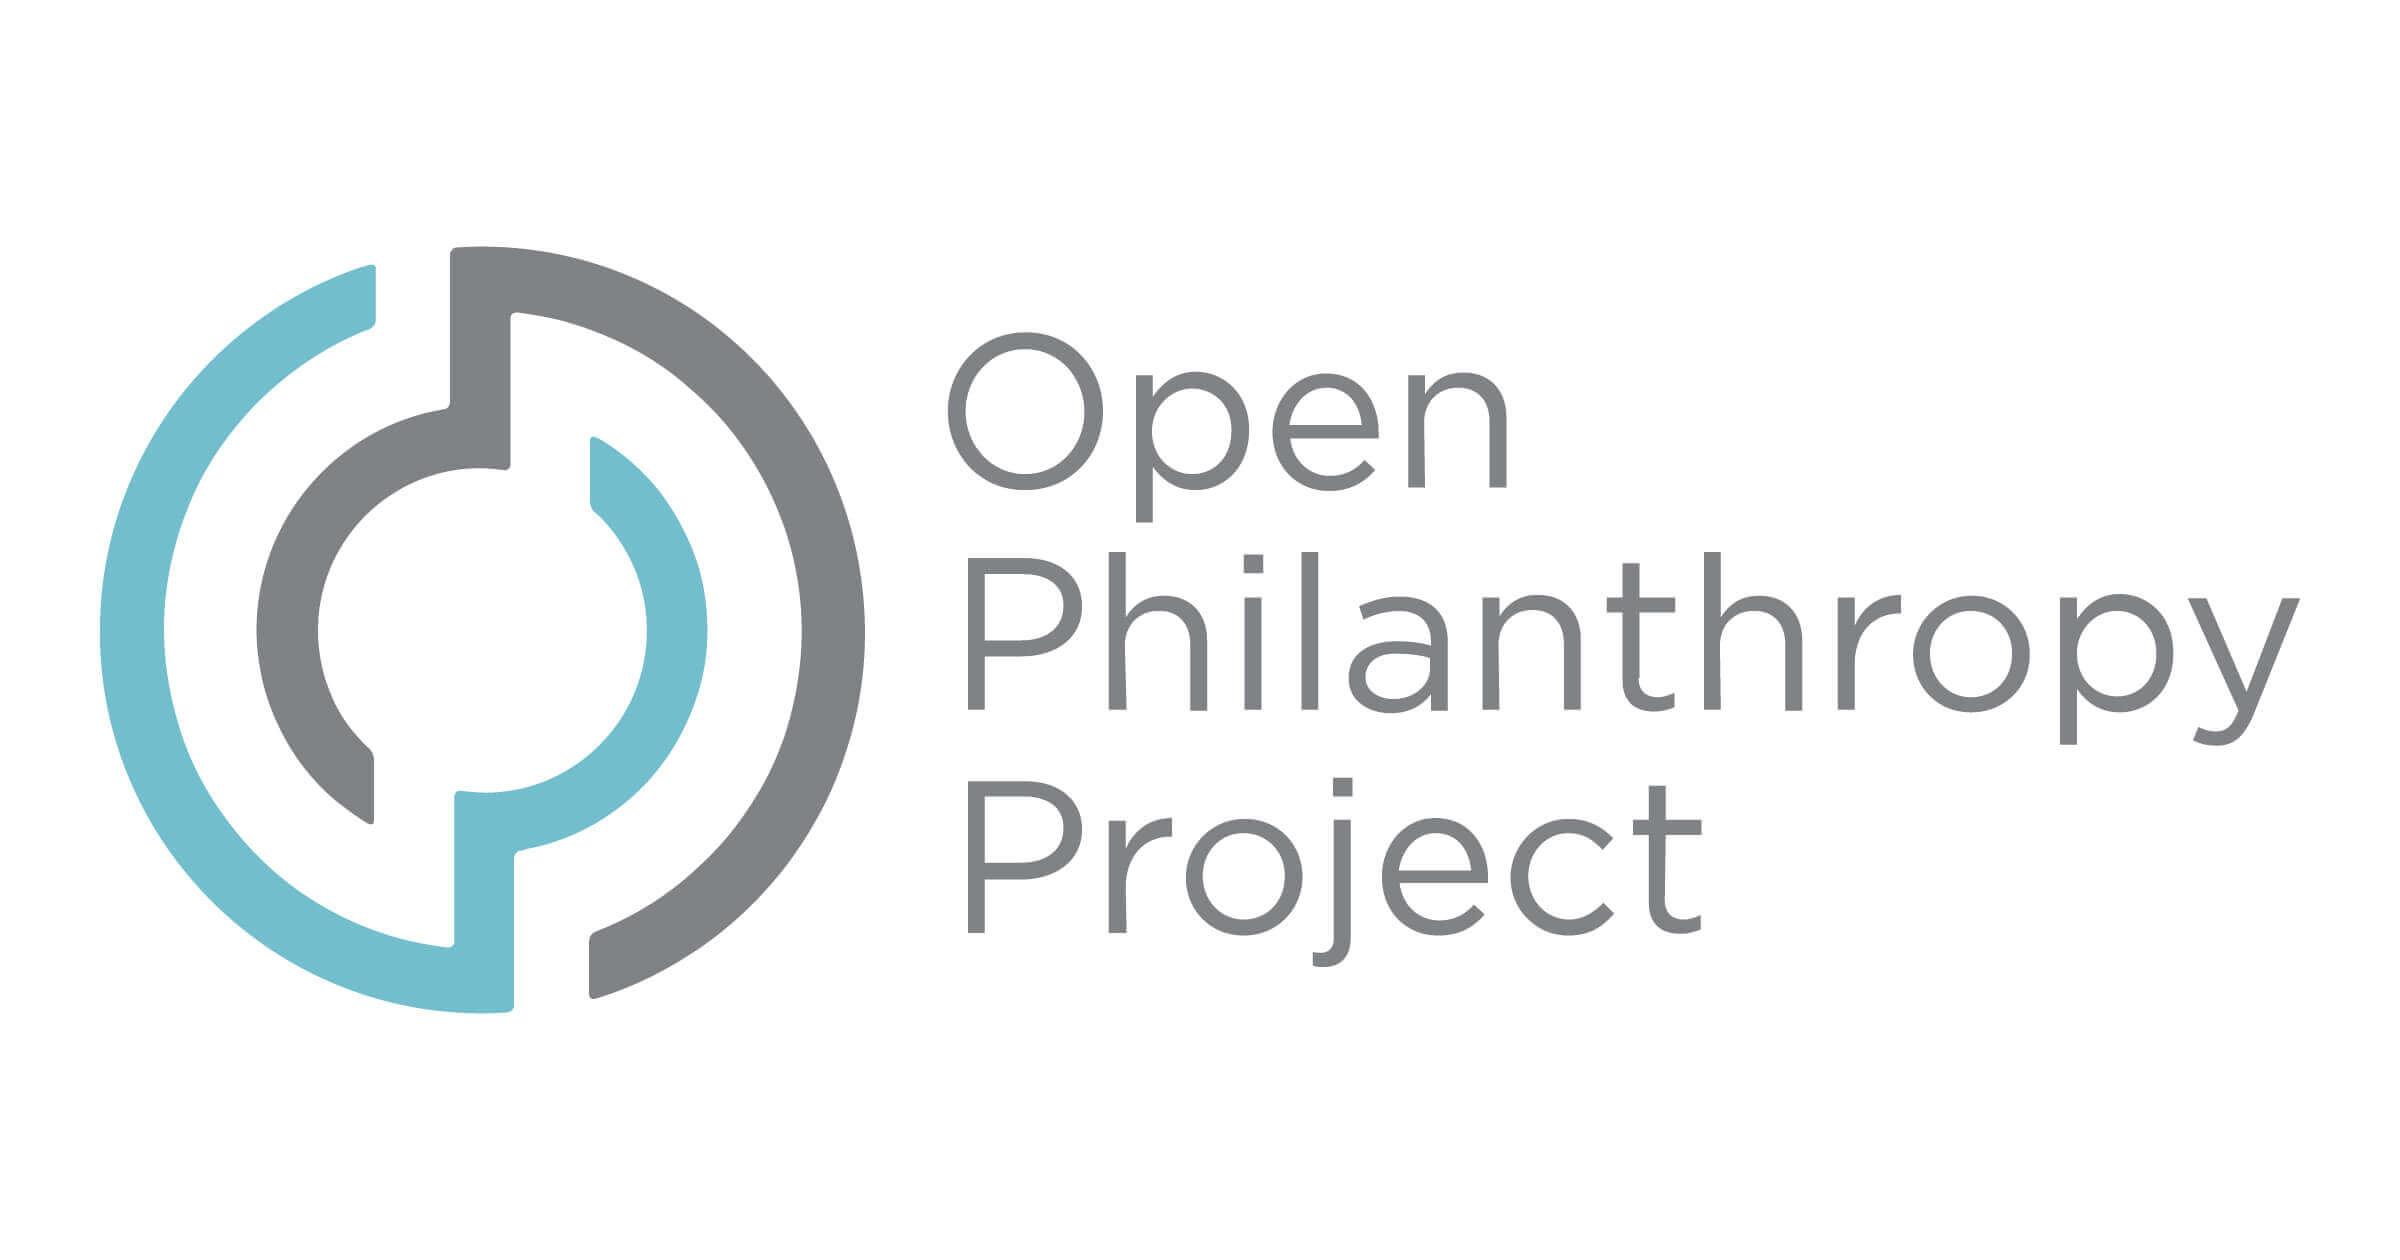 open-philanthropy-project-opp-share@2x.jpg